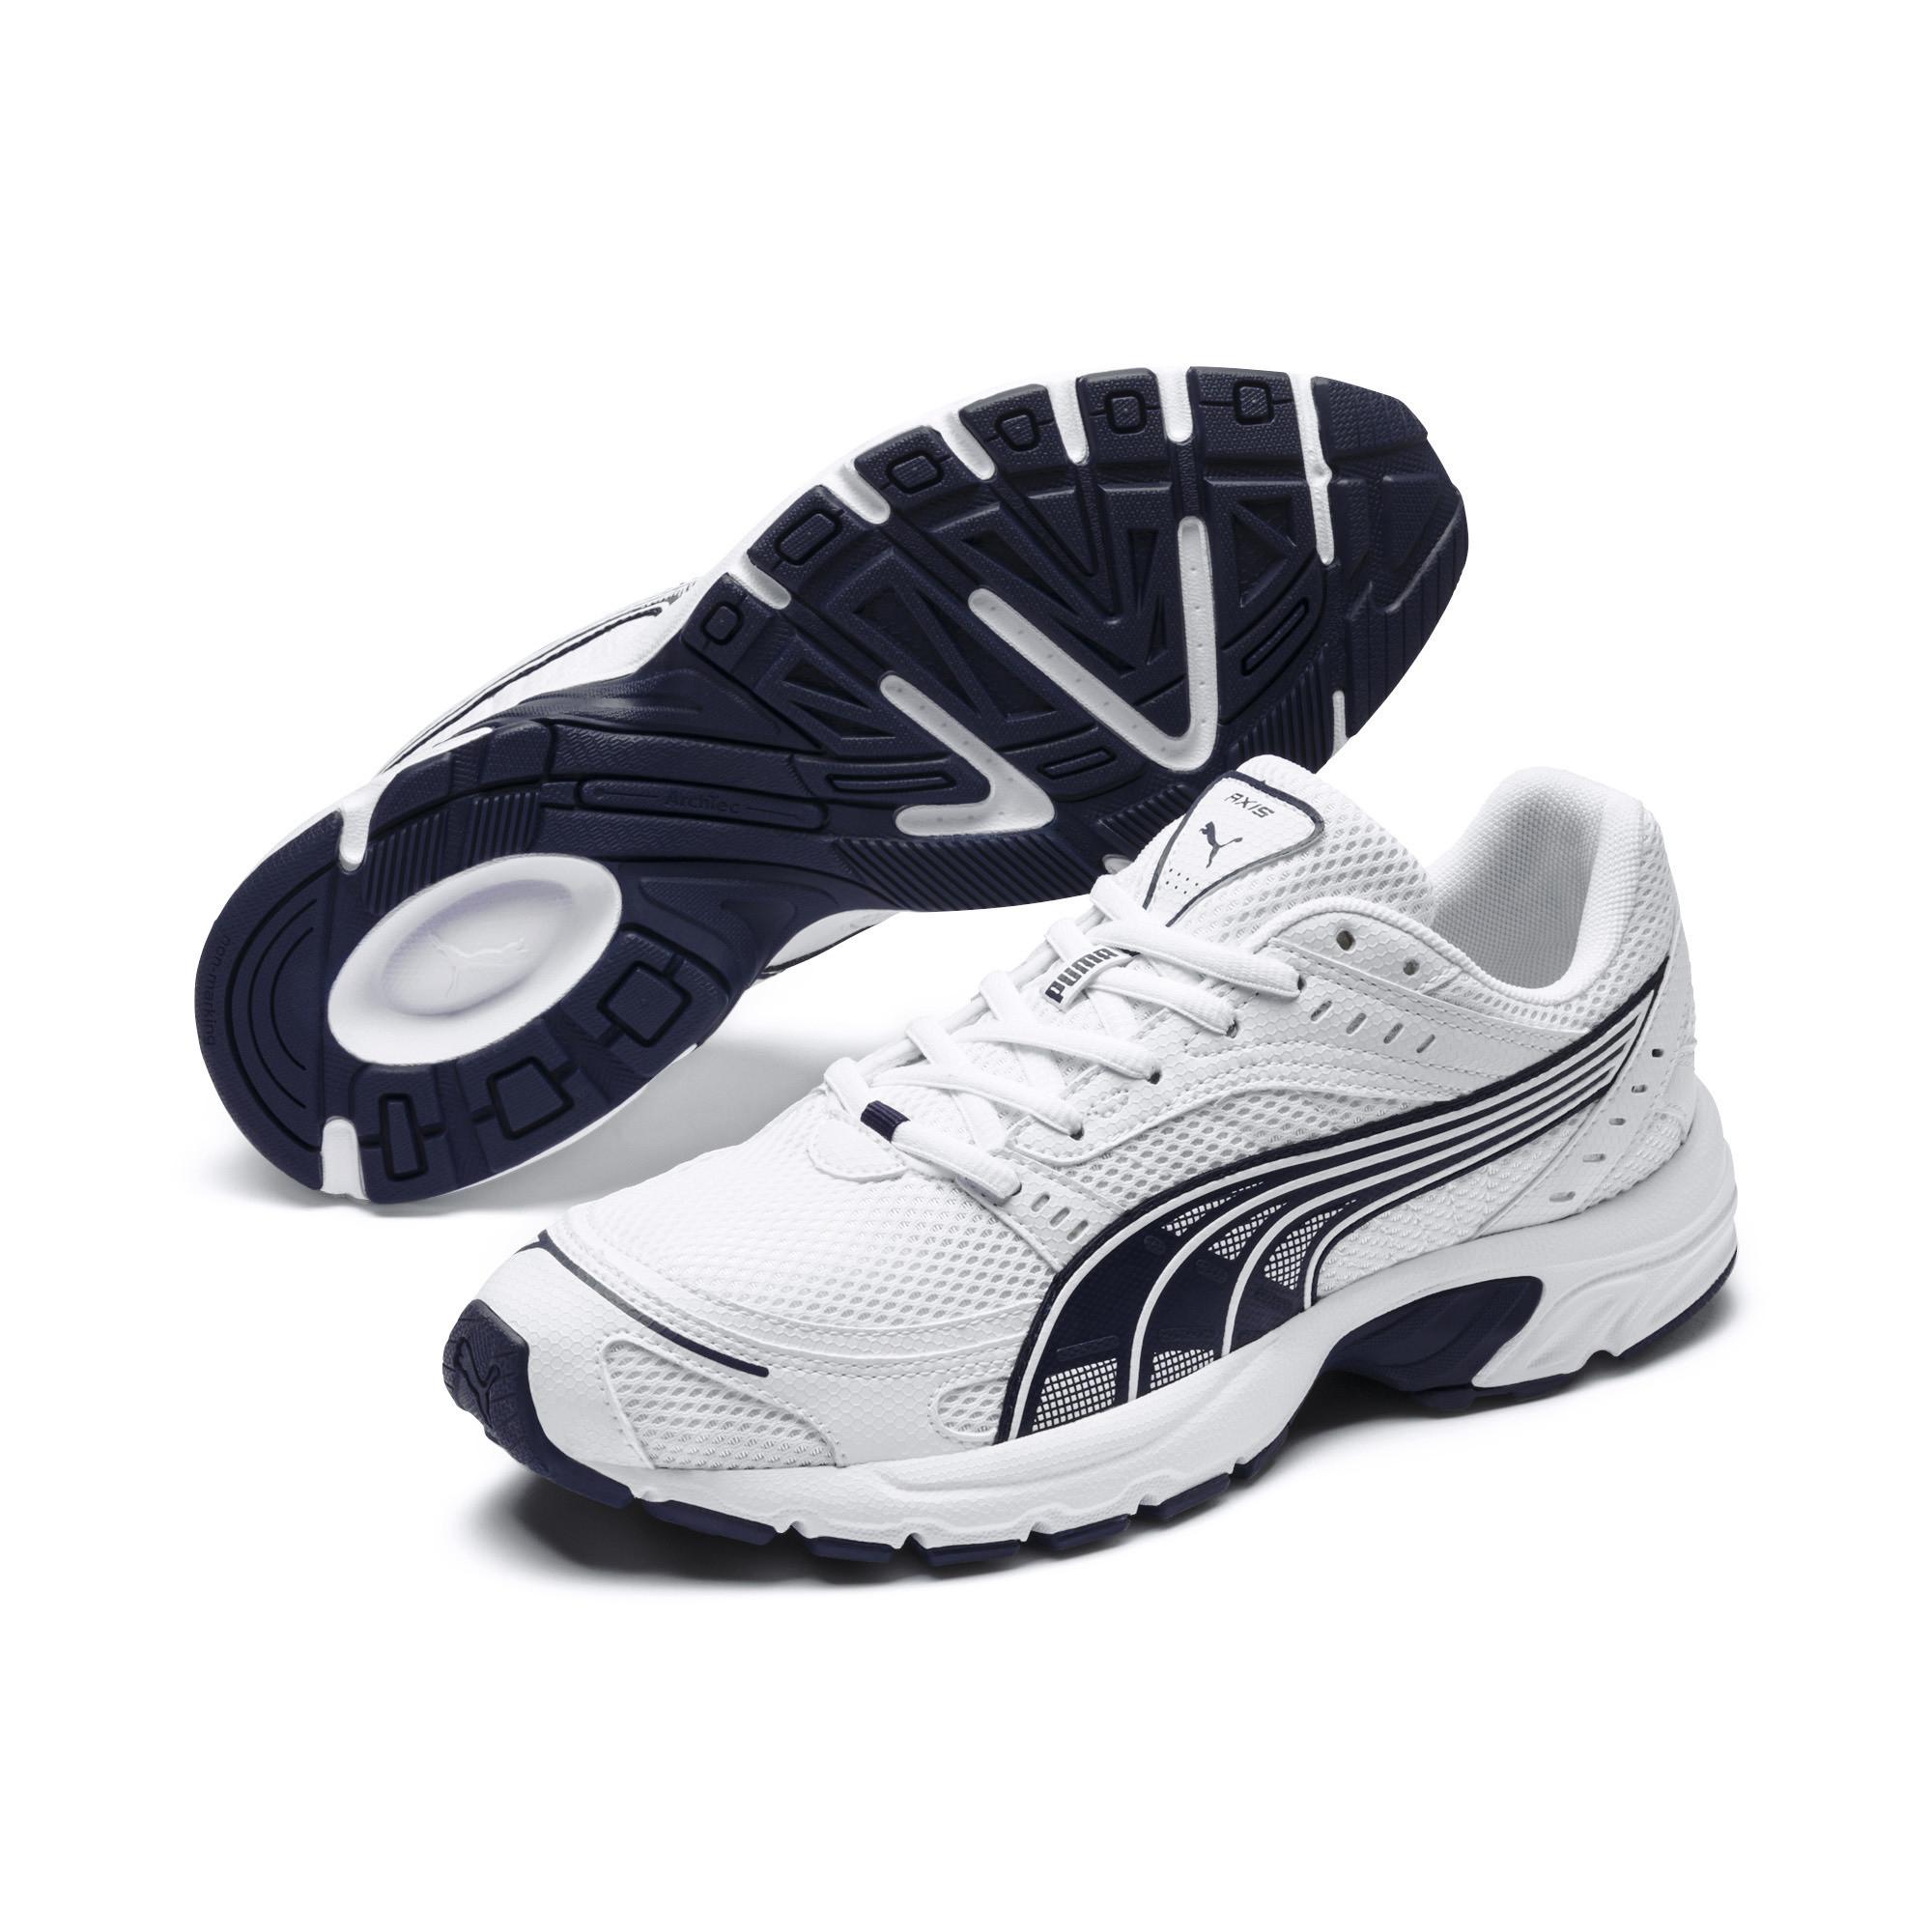 6ce3b77fe4 PUMA-Axis-Sneakers-Men-Shoe-Basics thumbnail 2